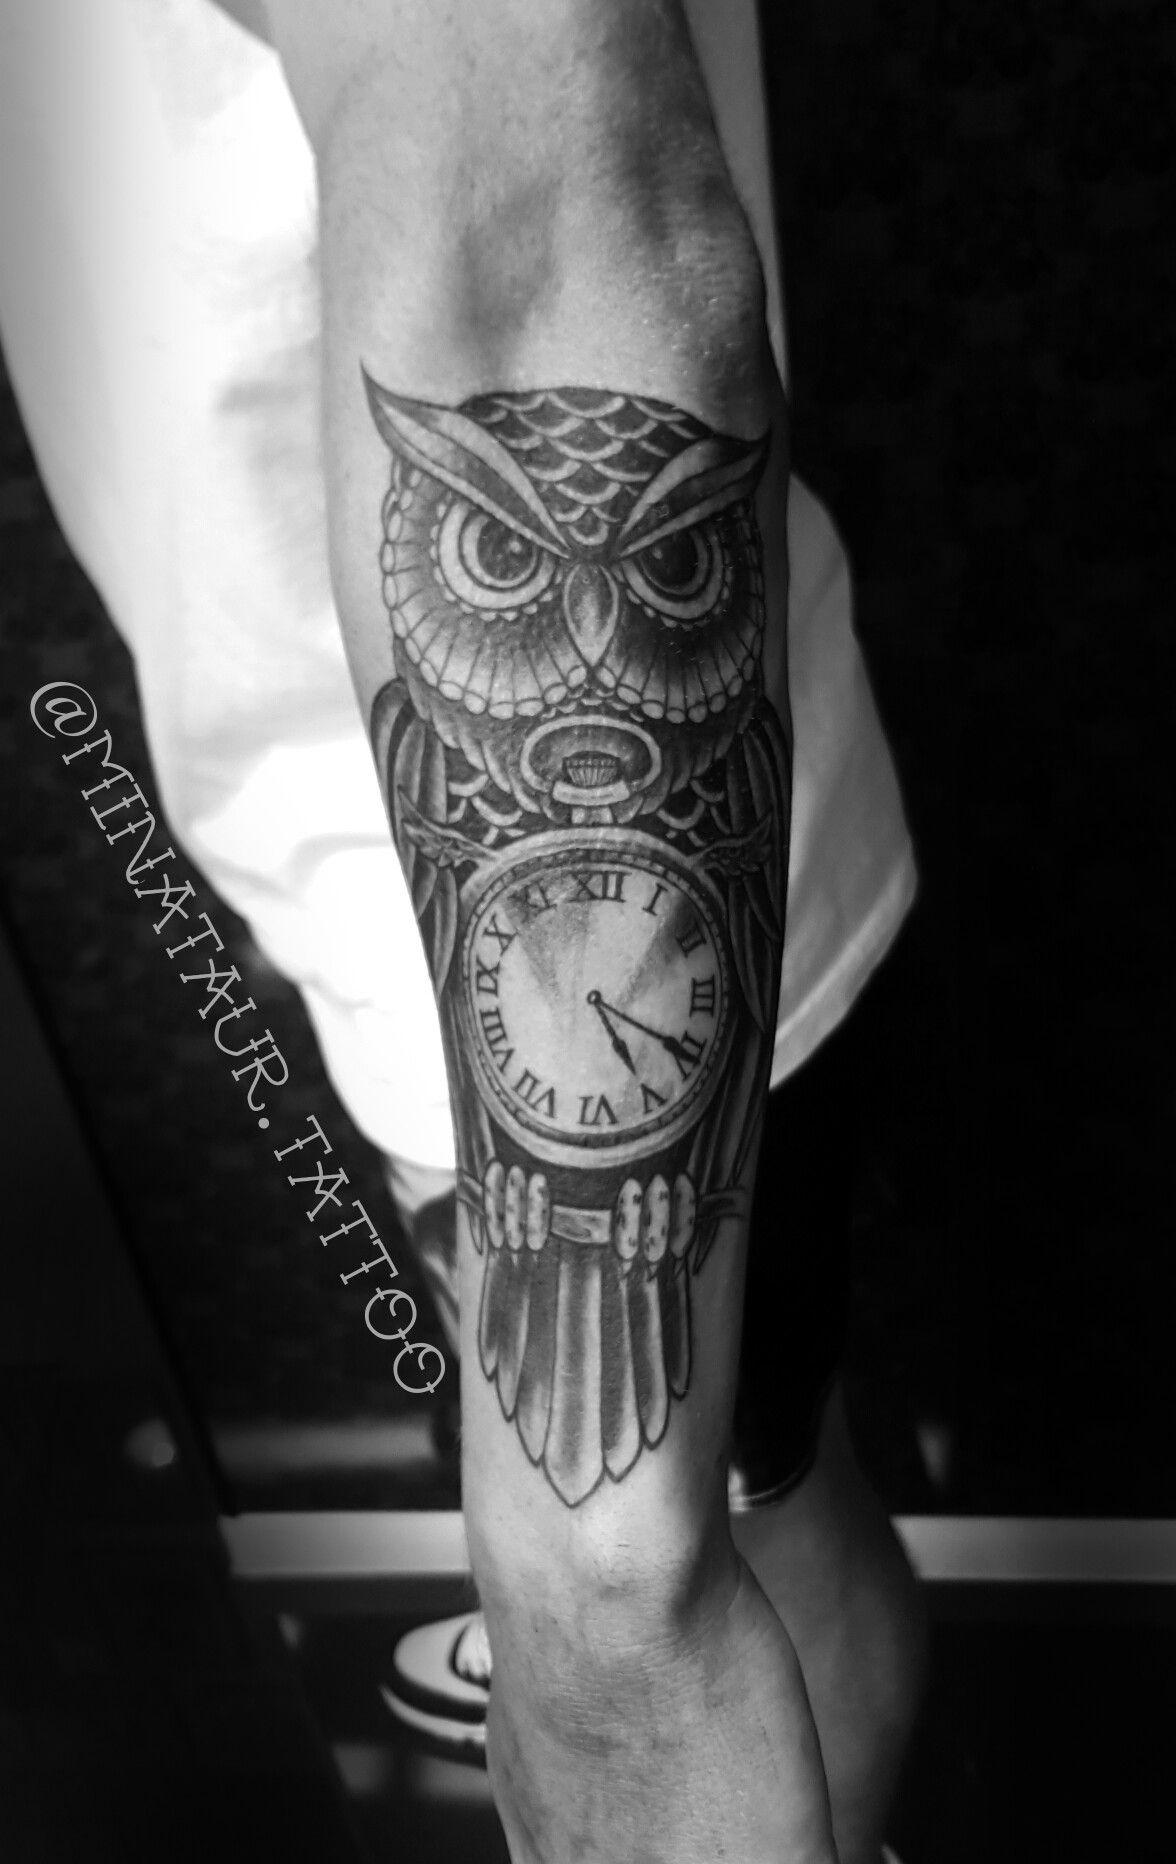 75 black and white tattoos for men masculine ink designs - El Reloj Esta Bien Para Tattoo 1